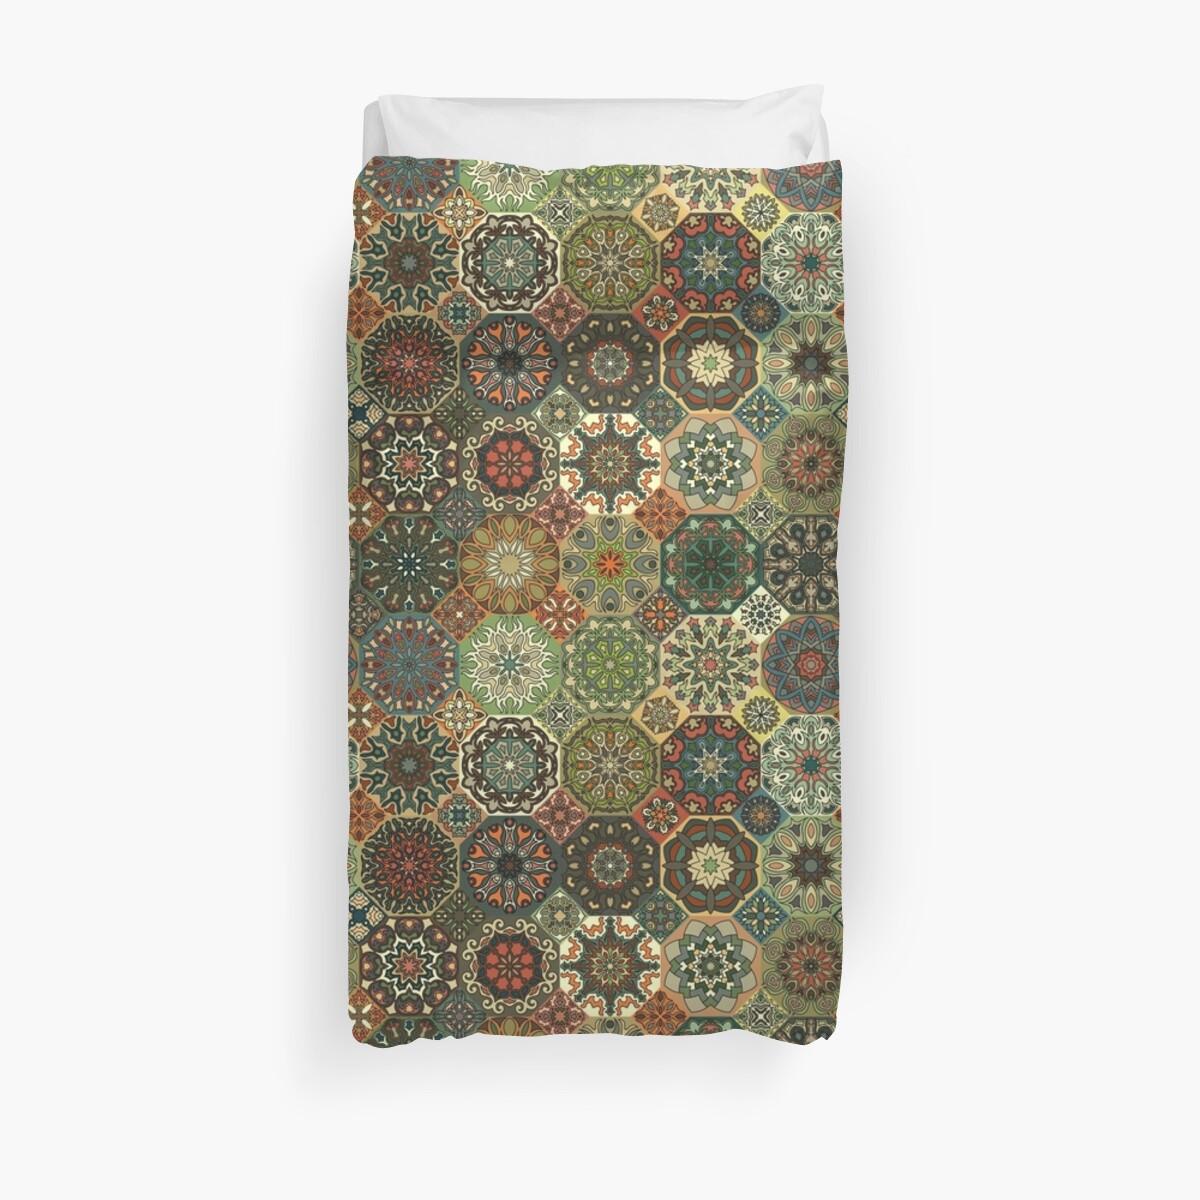 Vintage patchwork with floral mandala elements Duvet Cover